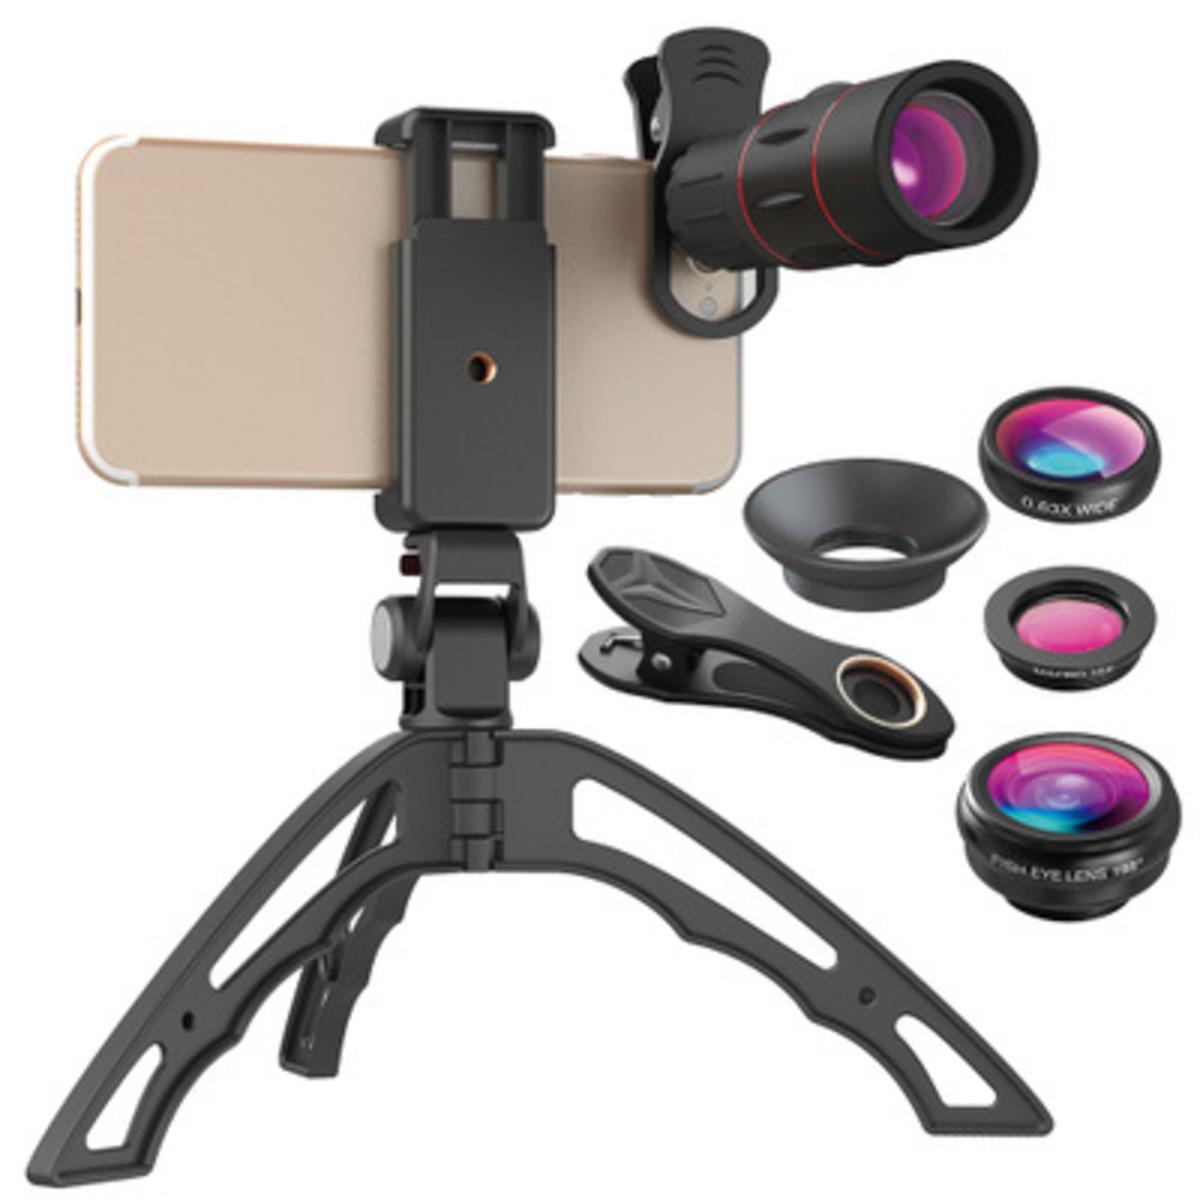 Hotbuy 4合1手機相機鏡頭套裝 帶有三腳架